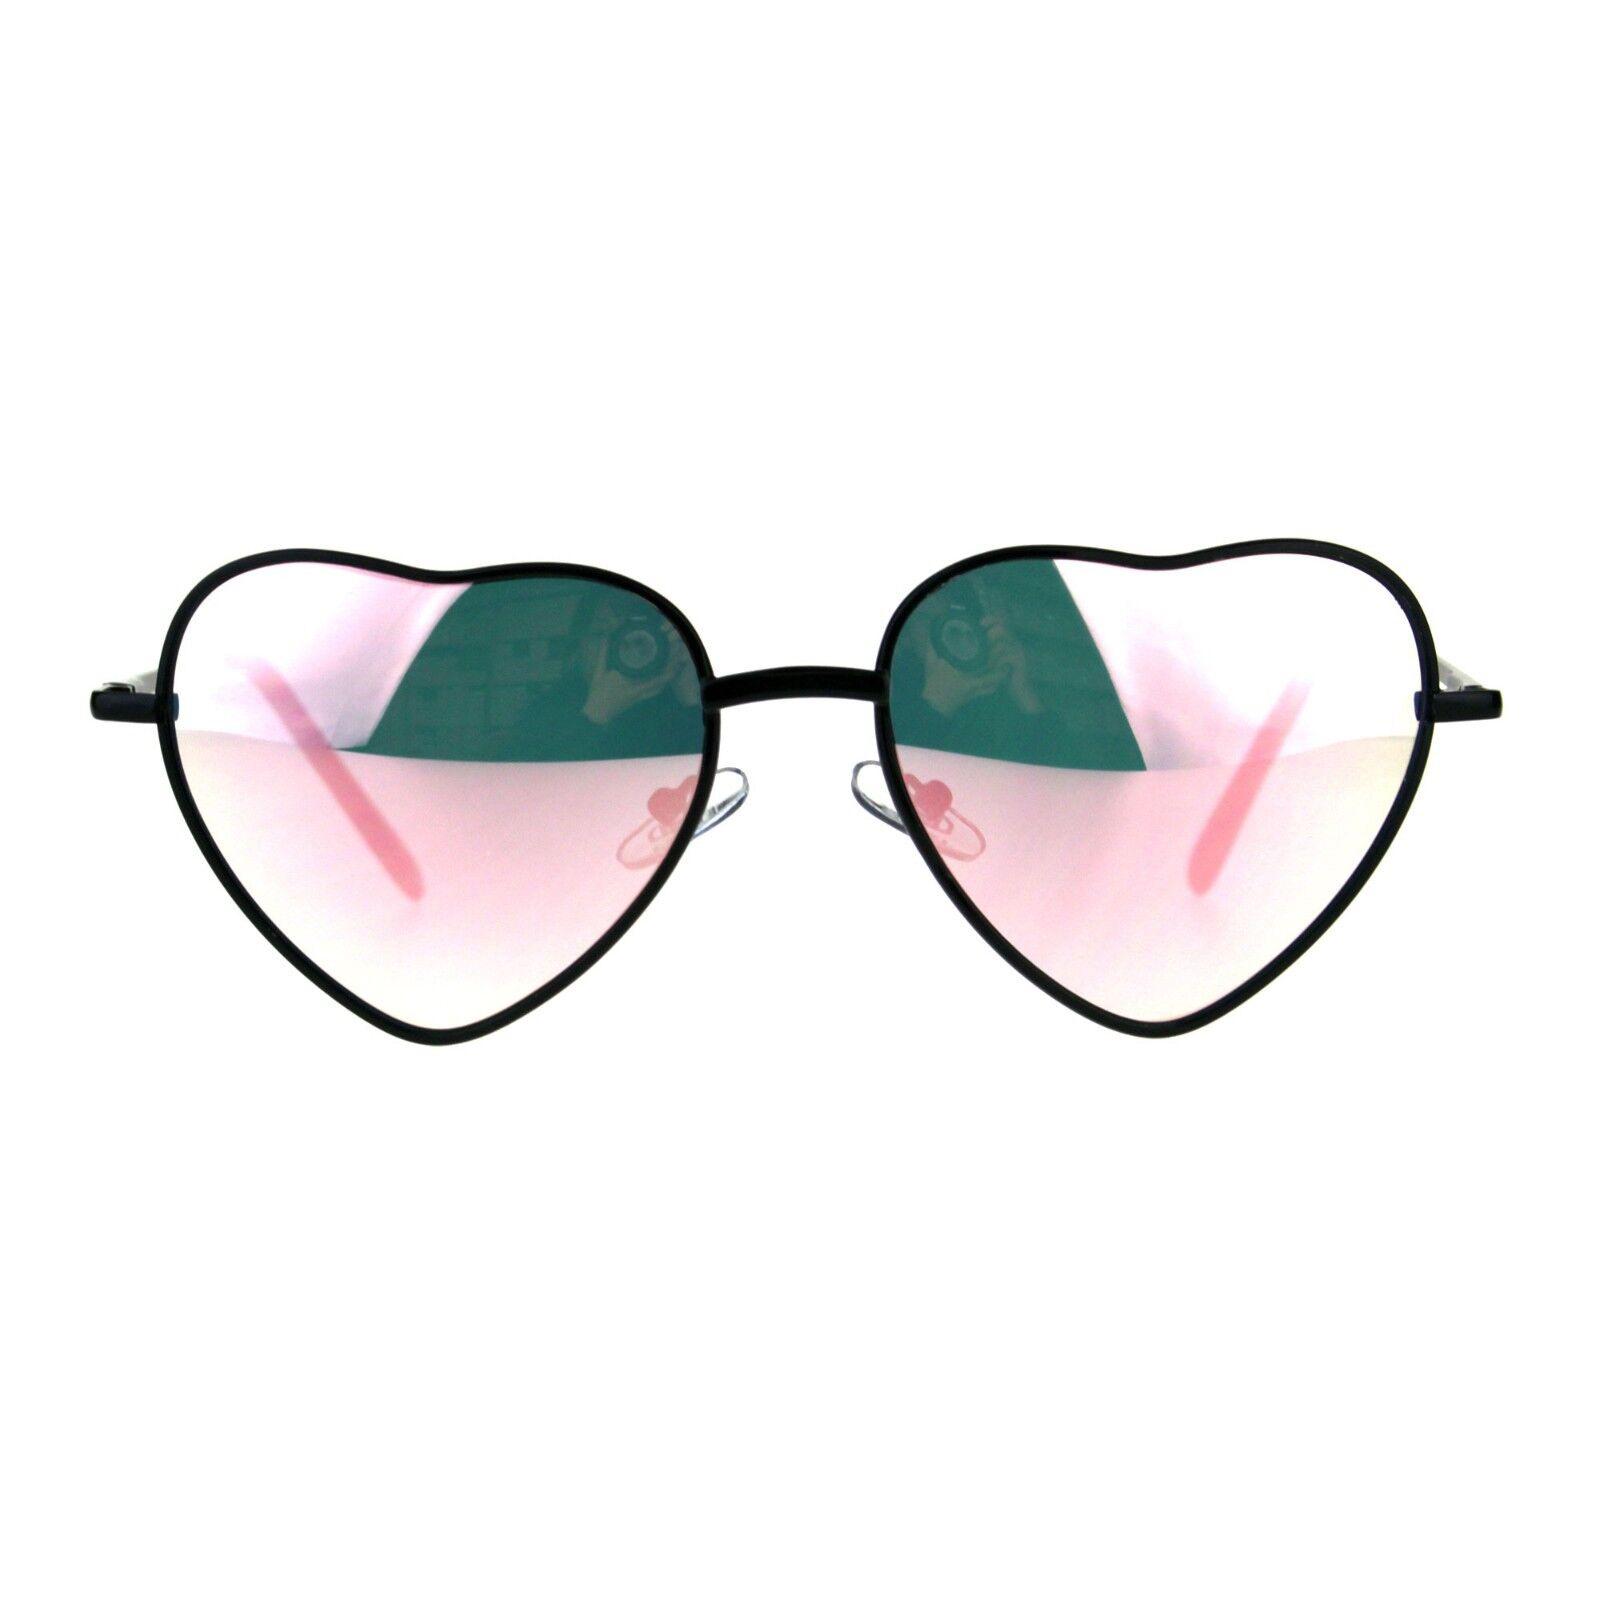 Heart Shape Sunglasses Pink Mirror Lens Metal Frame Spring H